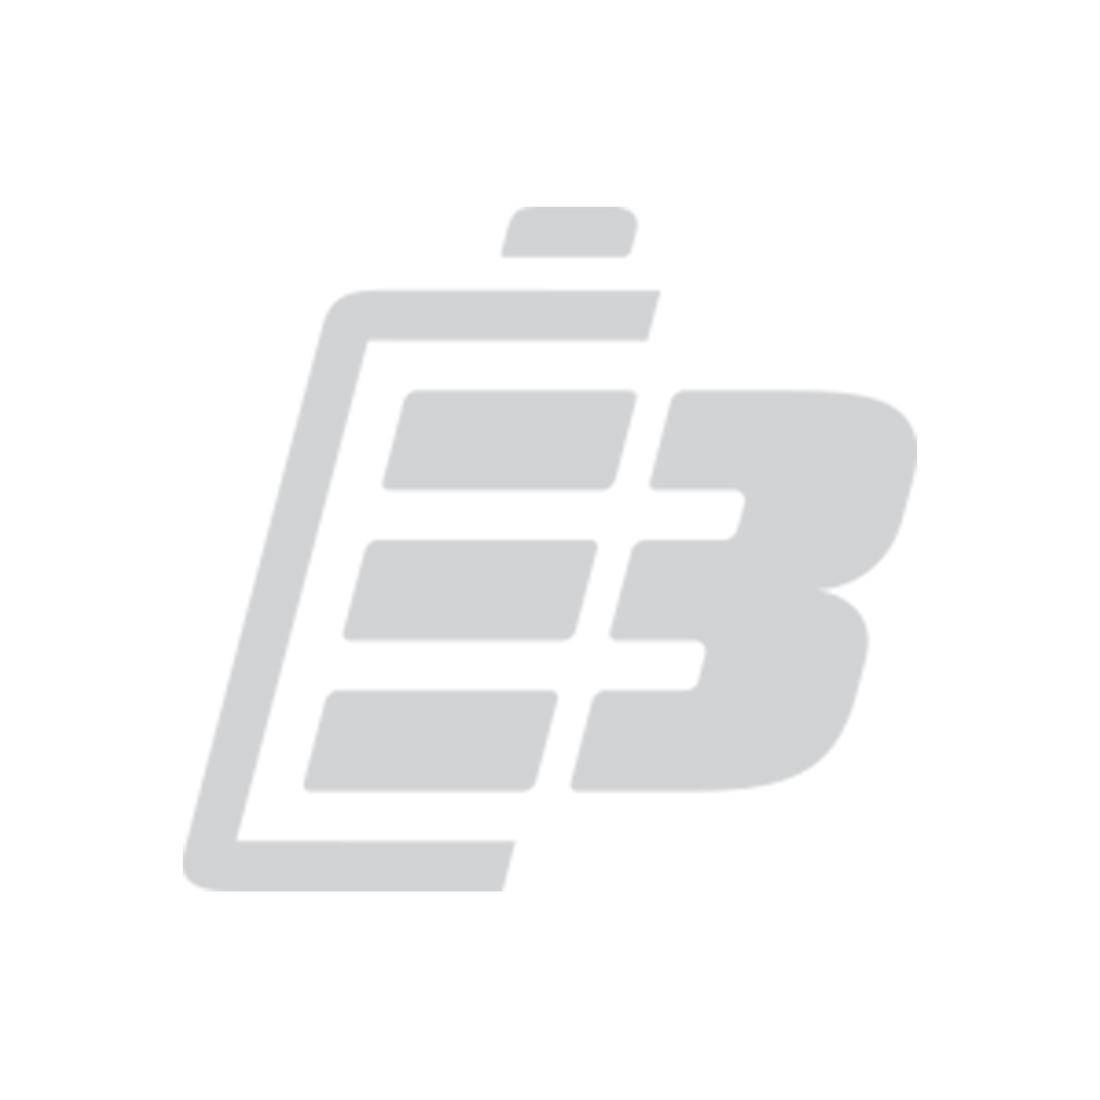 CSB LEAD BATTERY HRL634W_1